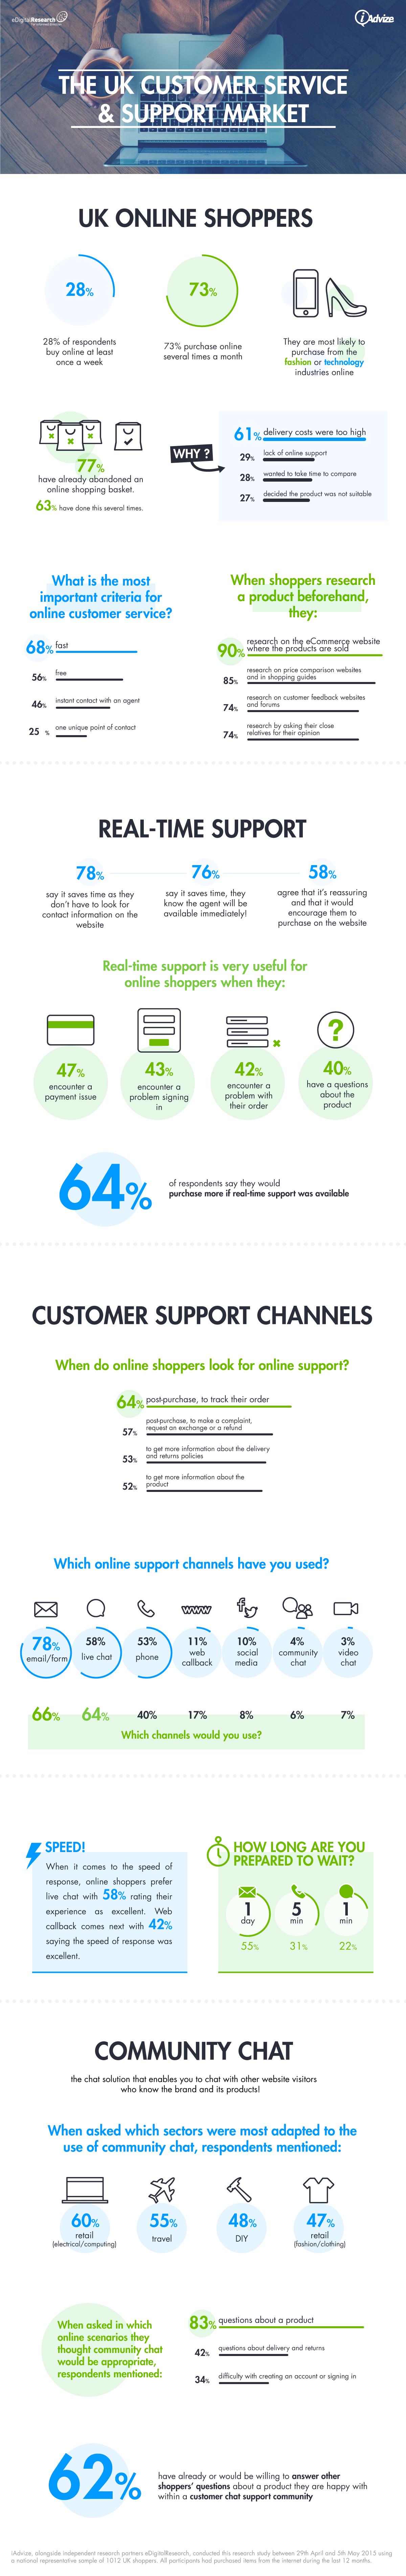 infographic-uk-customer-service-report